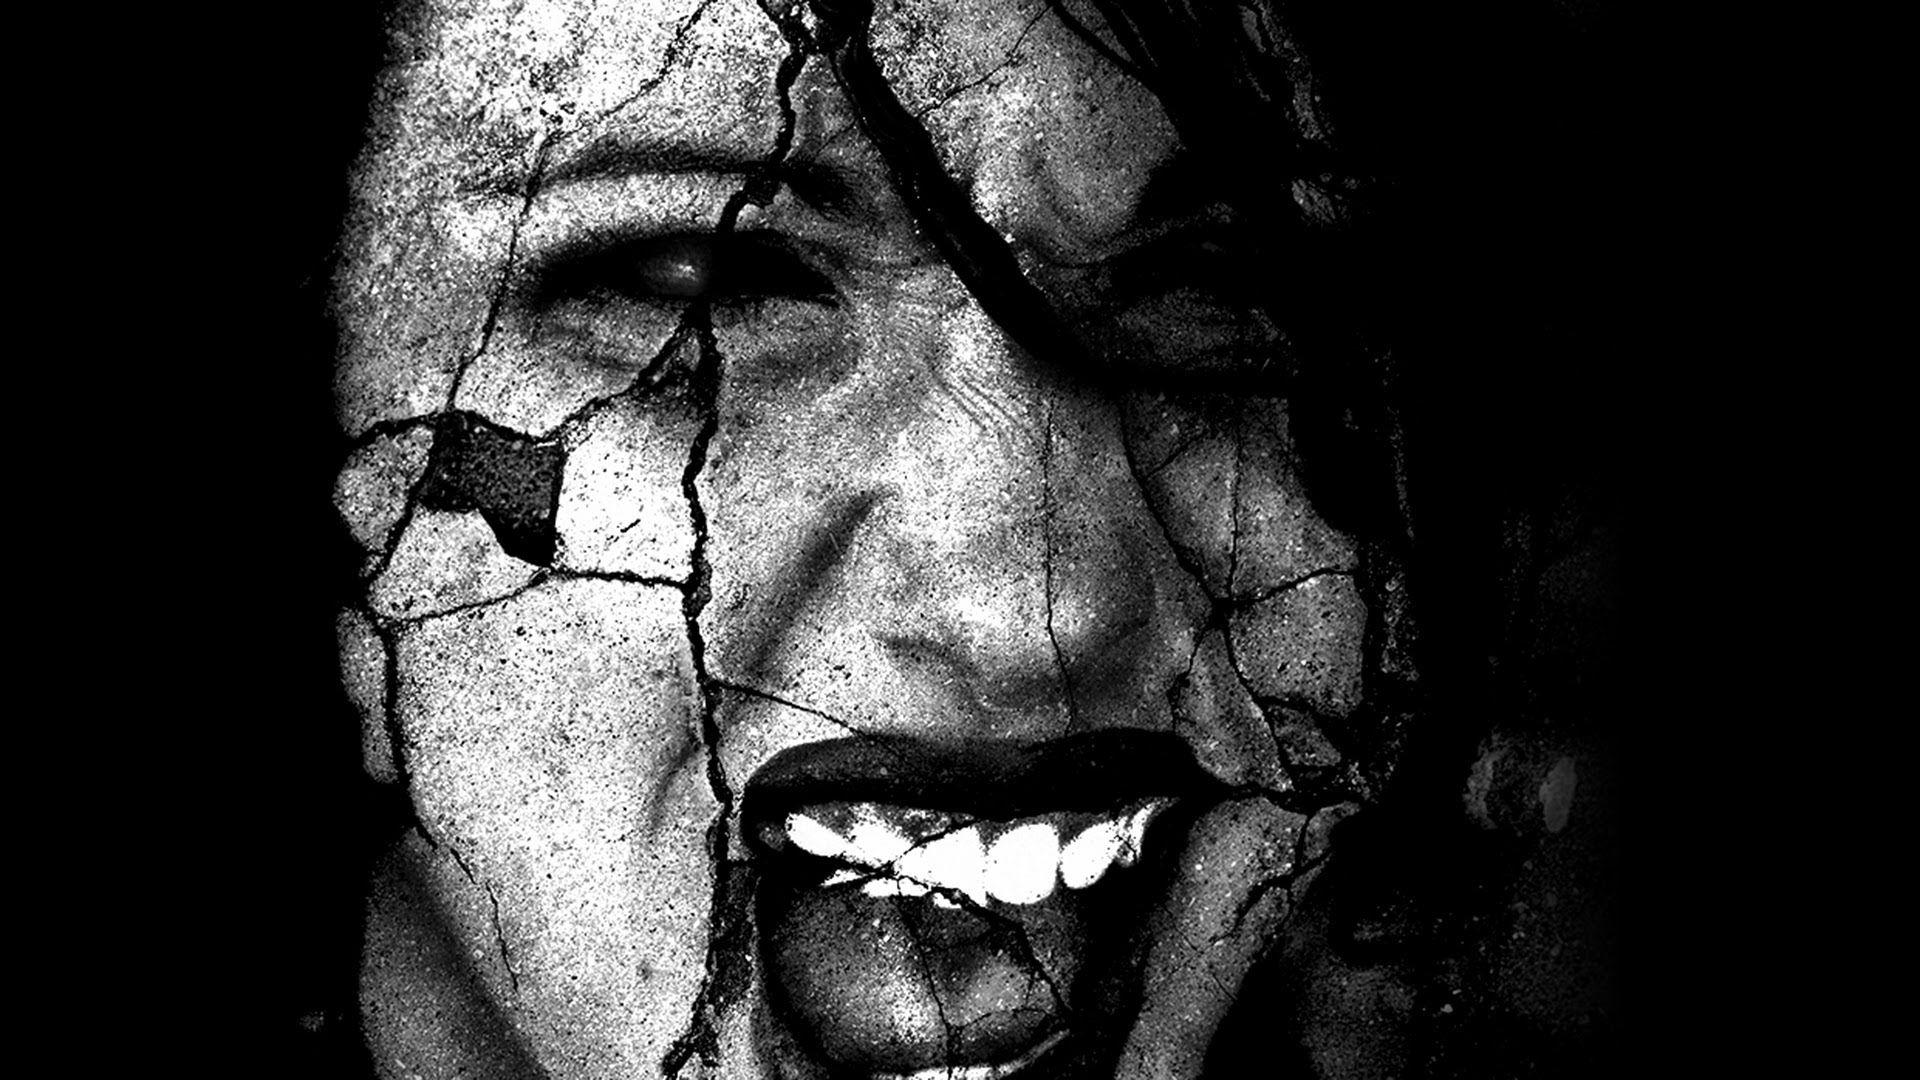 Shatter Effect - Photoshop CS6 Halloween Tutorial making